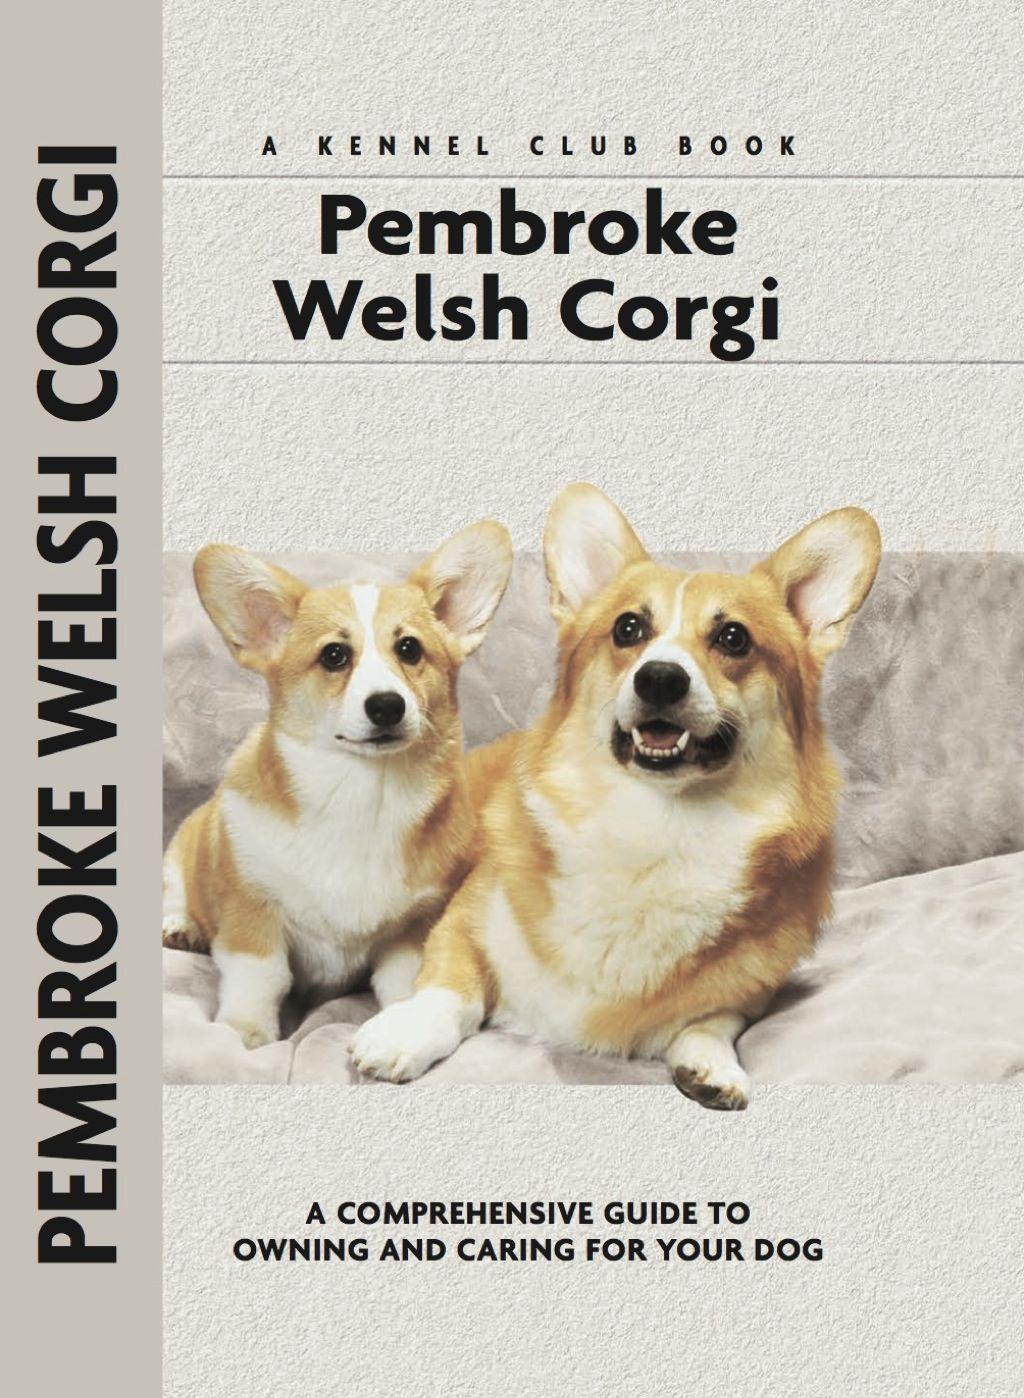 Pembroke Welsh Corgi Ebook Pembroke Welsh Corgi Corgi